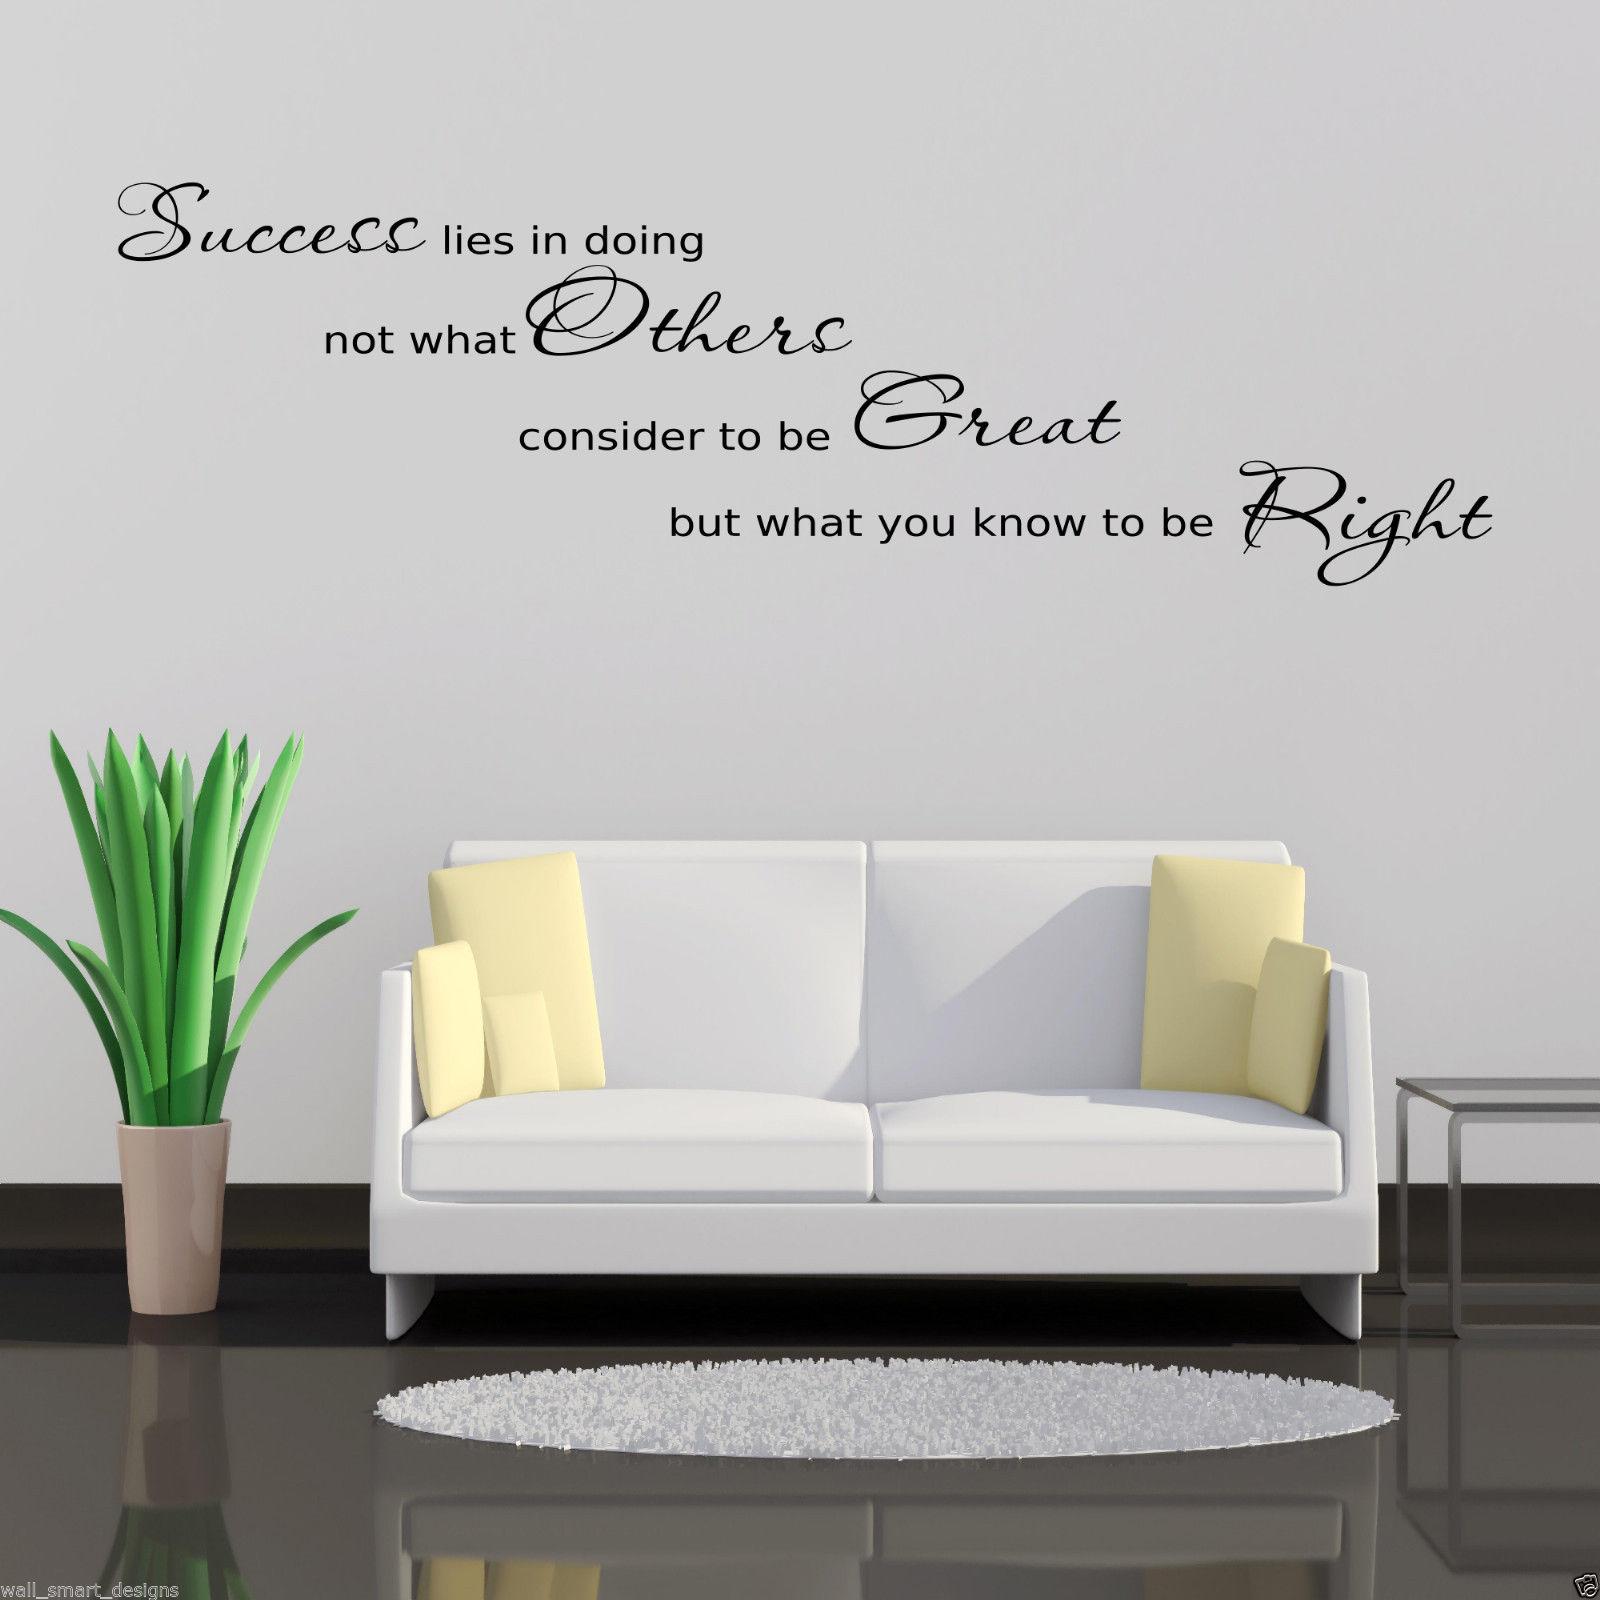 succ s bureau autocollant art mur hall salon citation sticker mural pochoir ebay. Black Bedroom Furniture Sets. Home Design Ideas